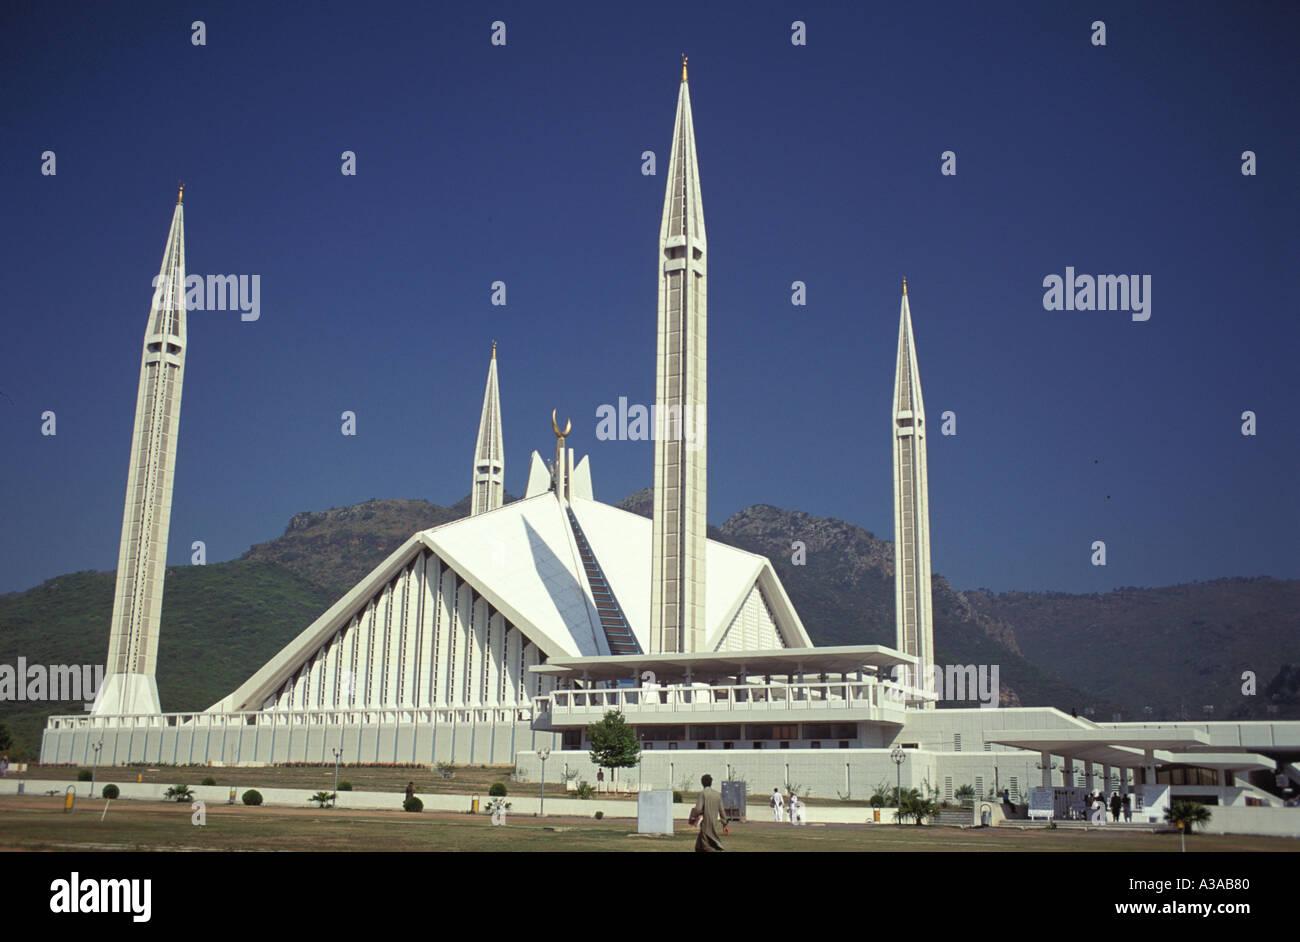 Faisal Mosque in Islamabad Pakistan - Stock Image